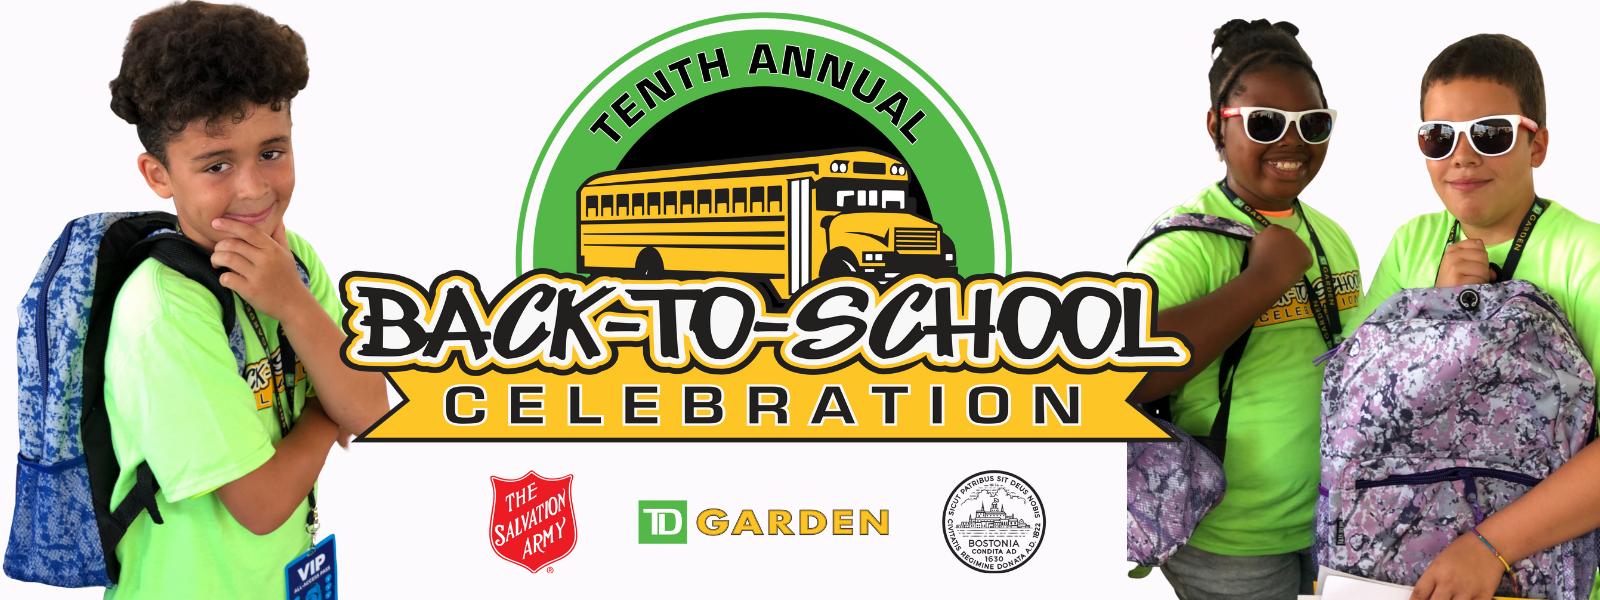 Register for Back-To-School Celebration